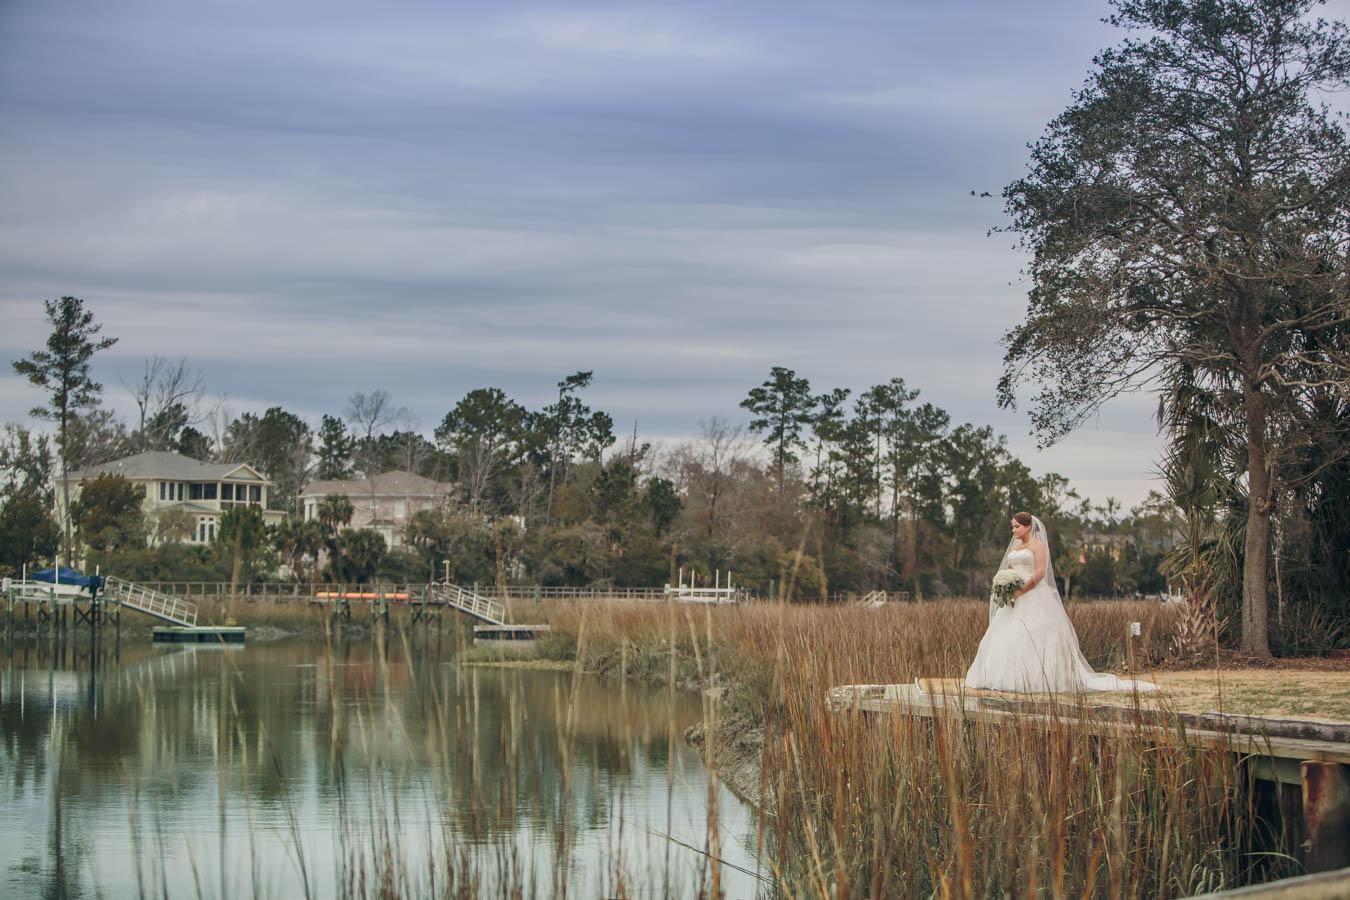 Bridal Portrait Over the Marsh